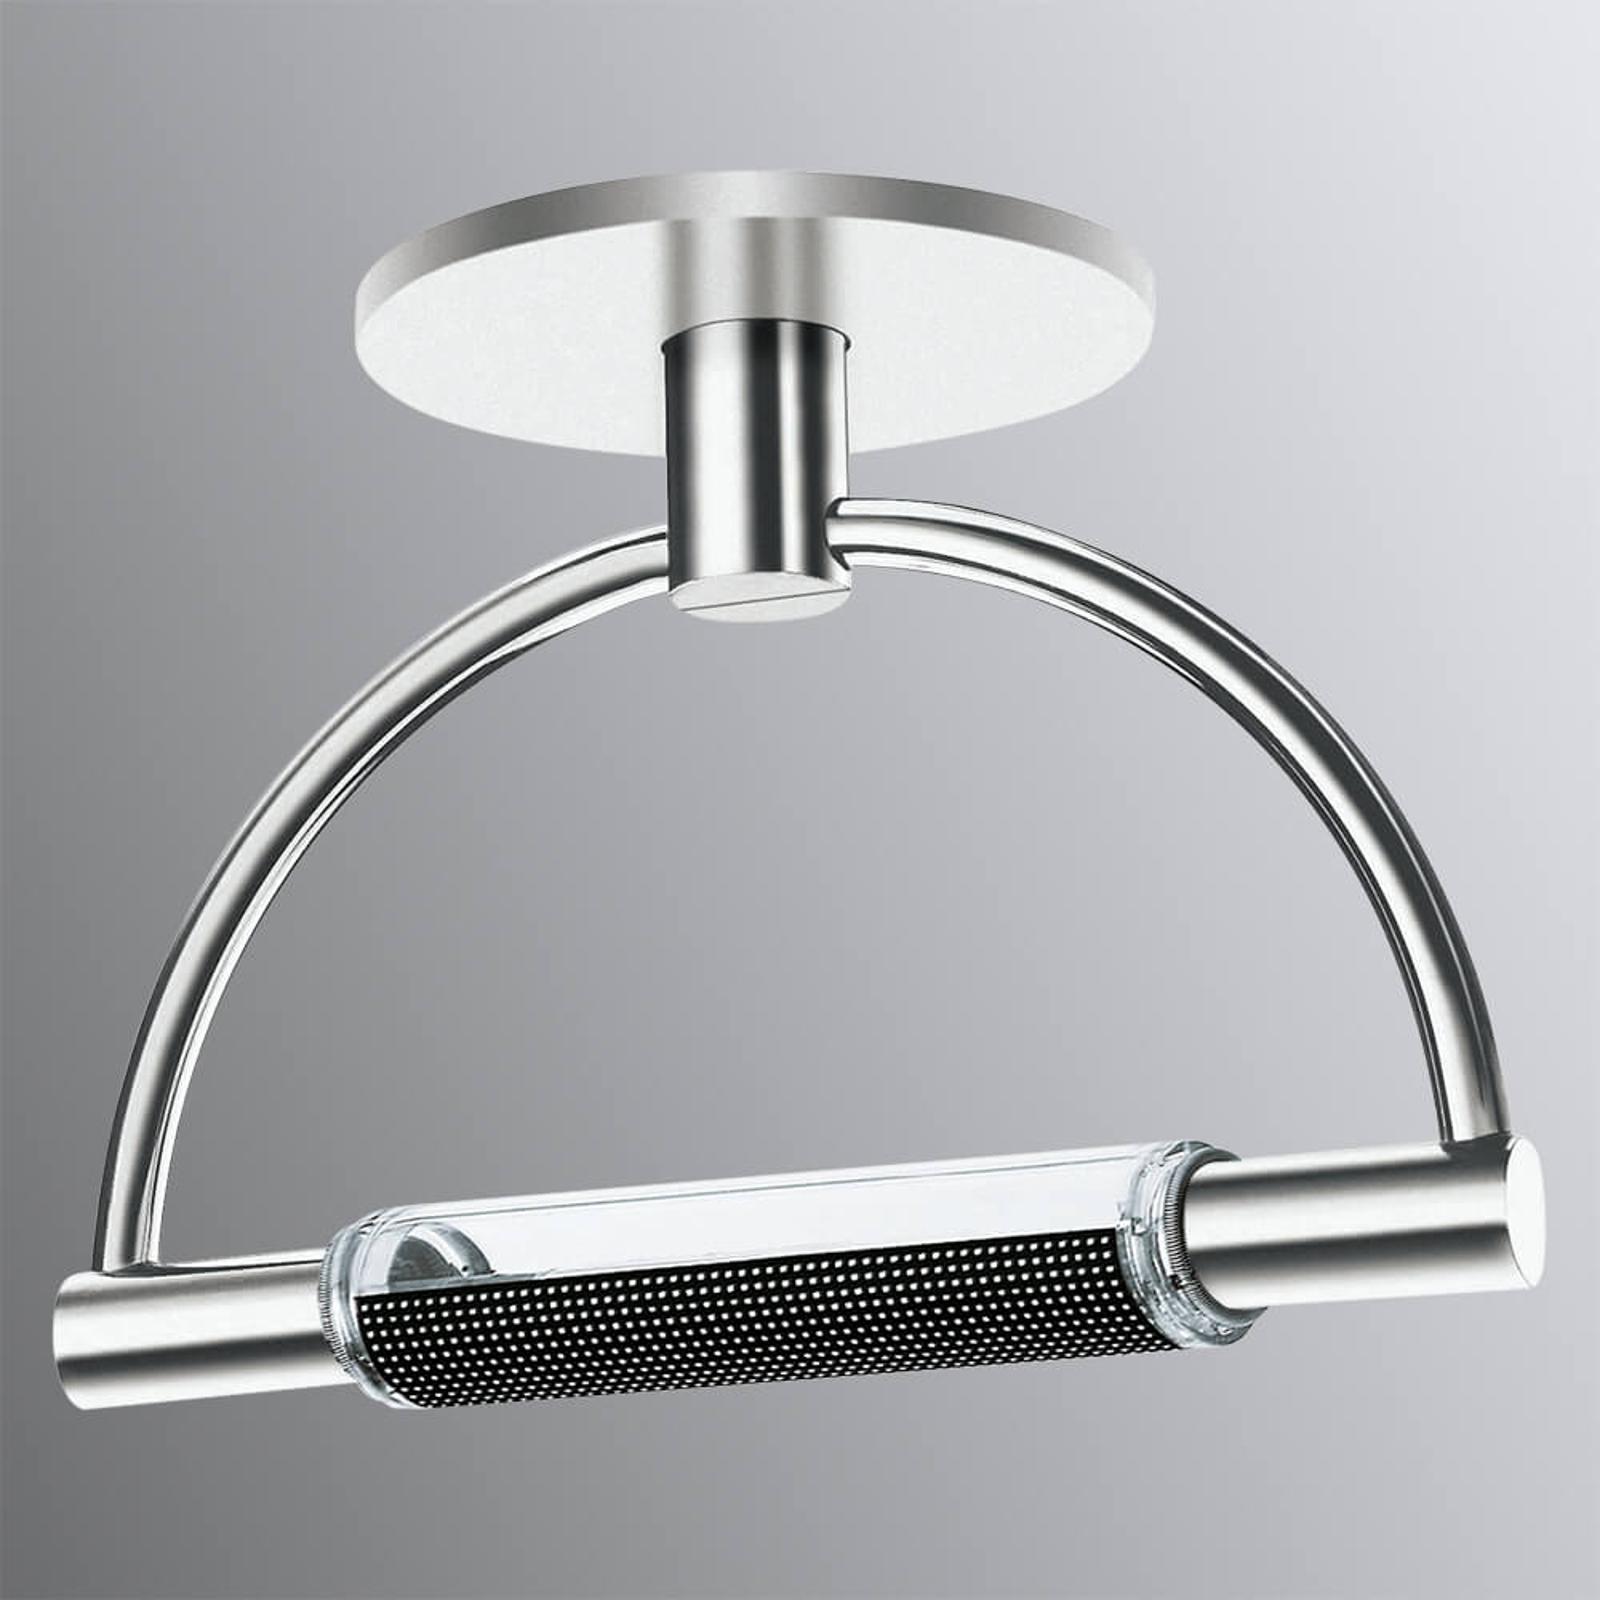 Cini&Nils Gradi - LED-Deckenleuchte m. Chromfinish